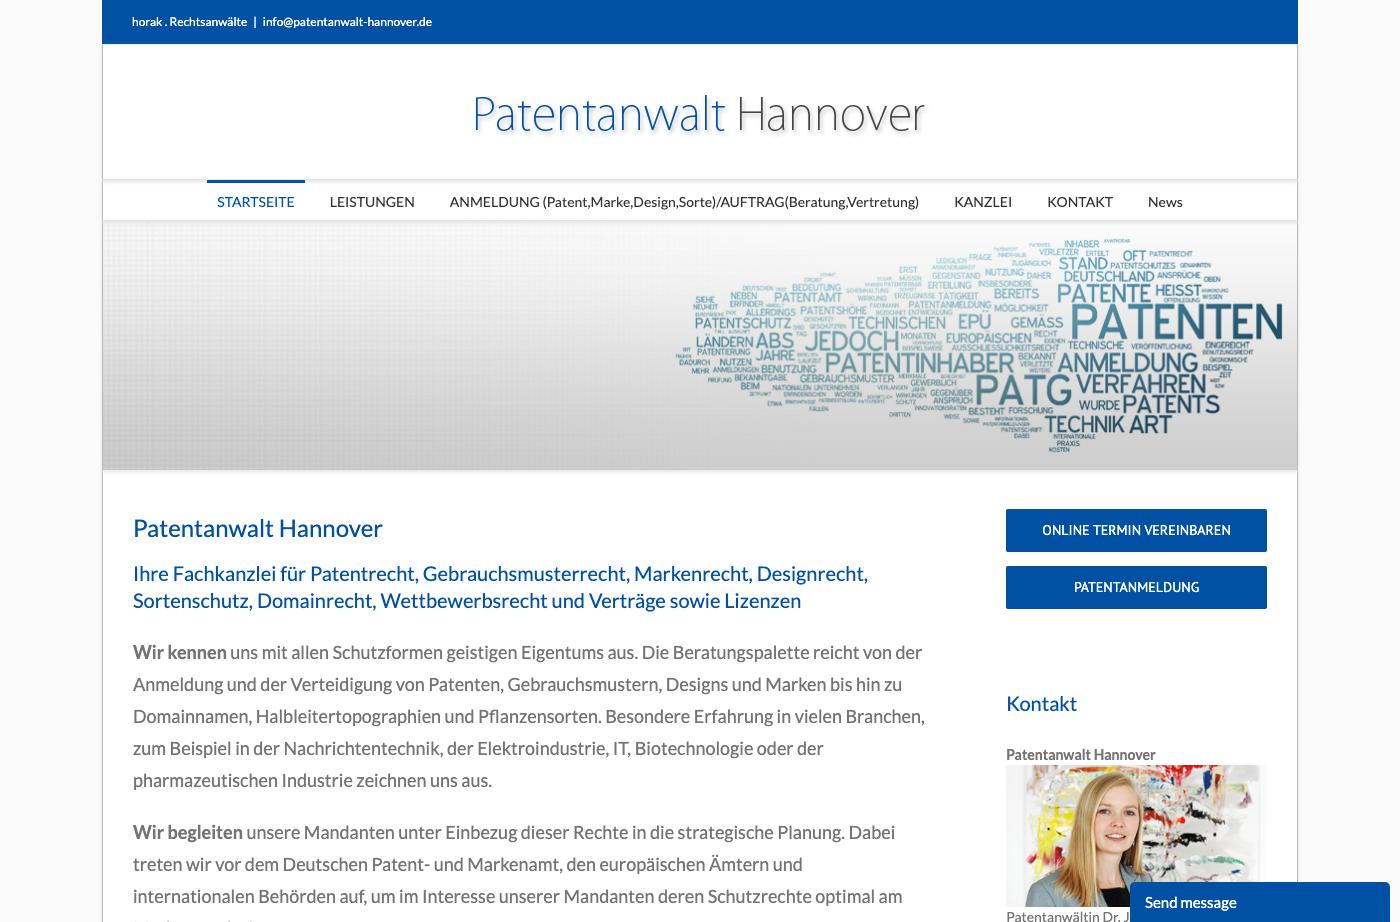 patentanwalt-hannover